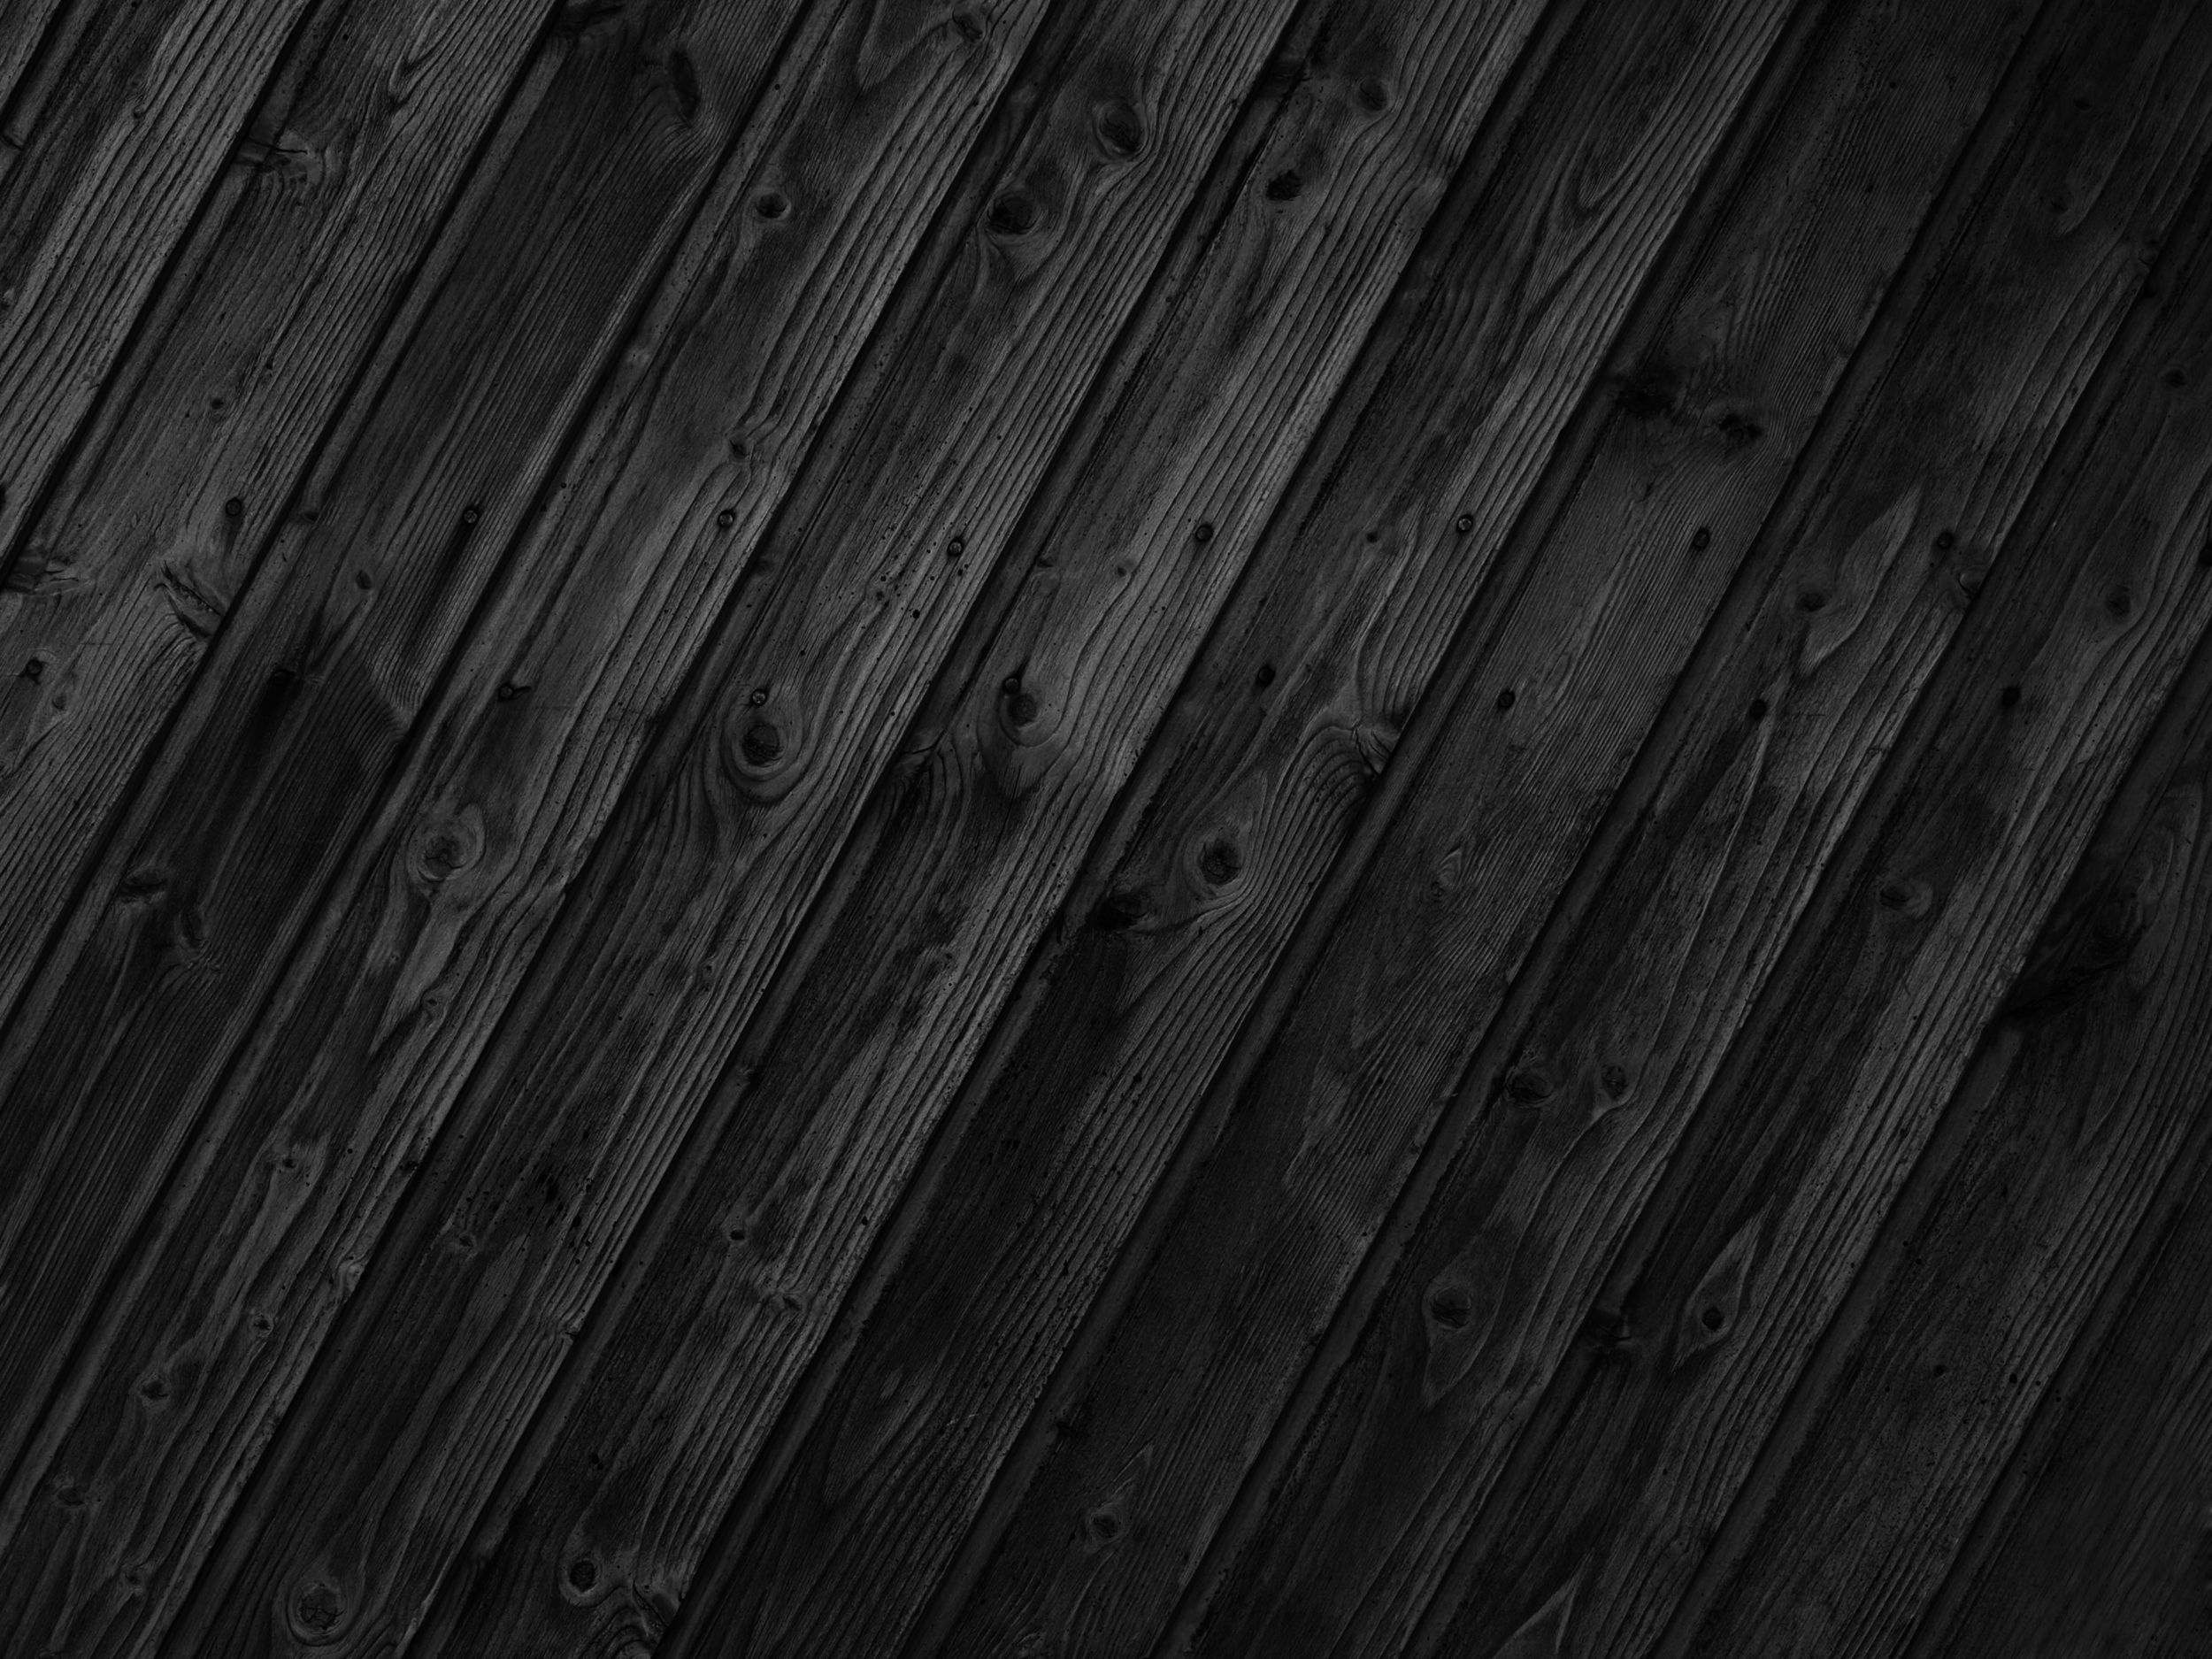 Black Wallpaper Hd Android Desktop Abstract Iphone 5 Design Backgournd Black Wood Background Black Wood Texture Wood Texture Background